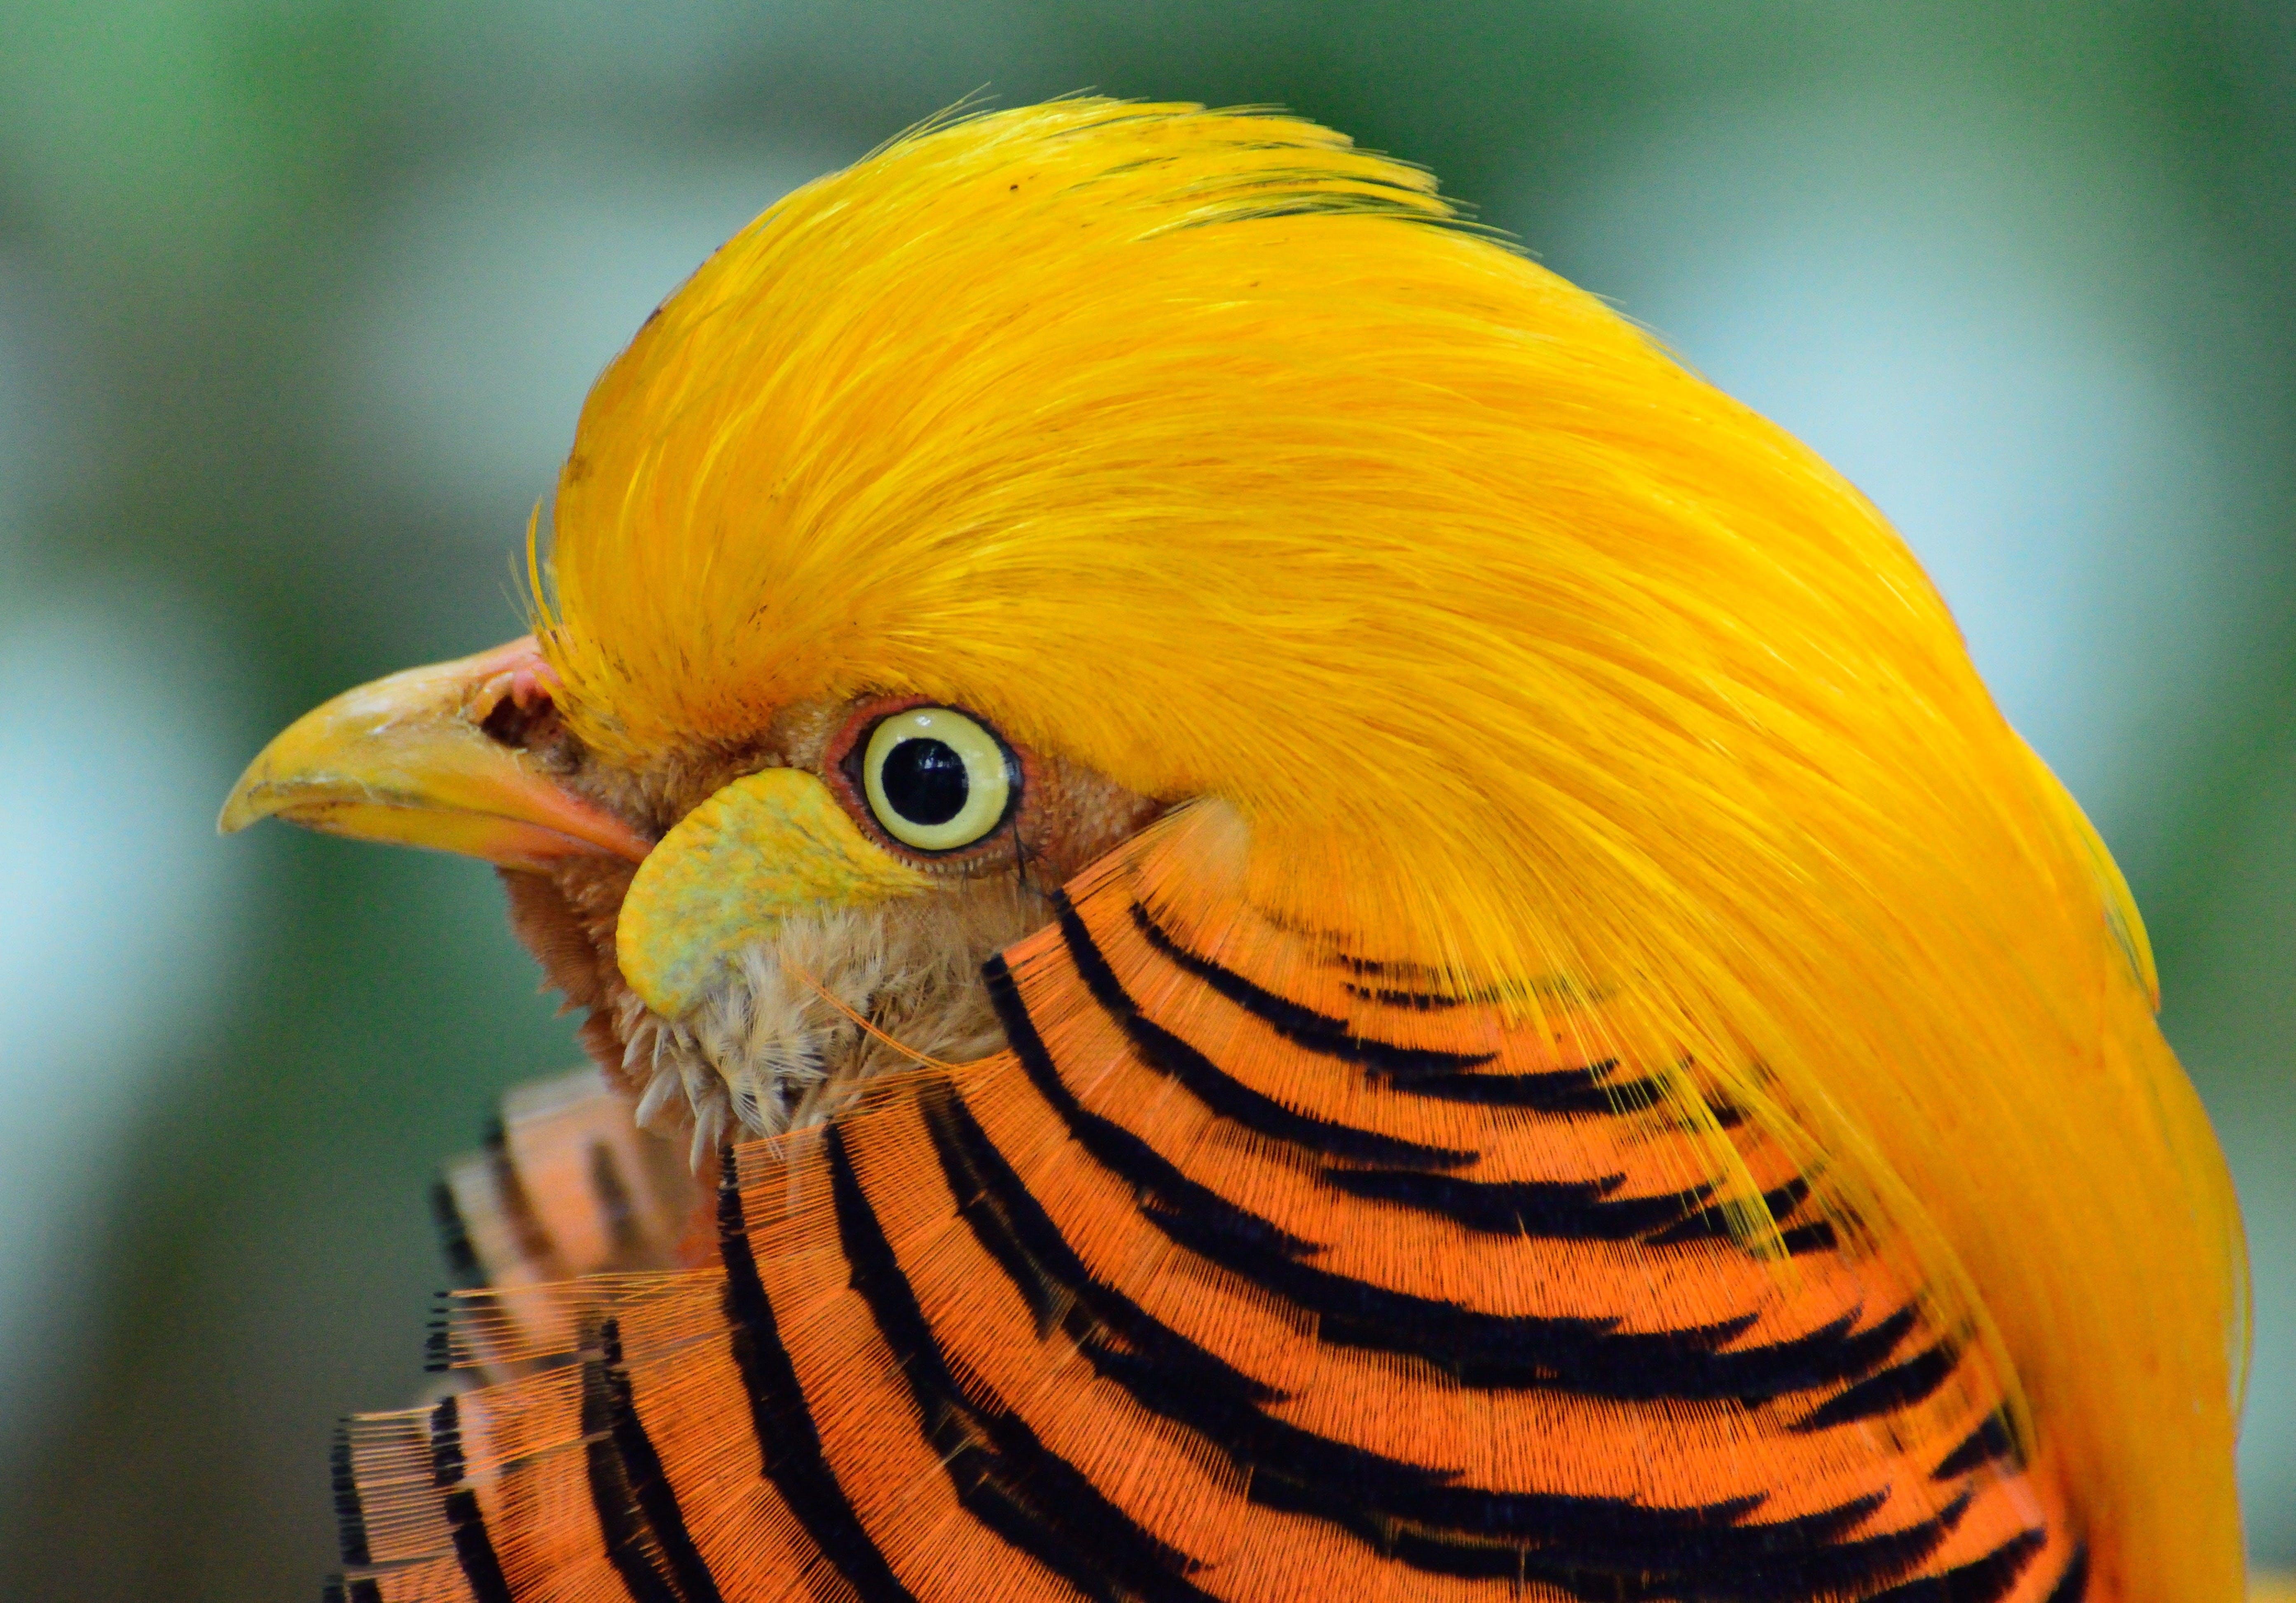 Yellow Black and Orange Bird Head